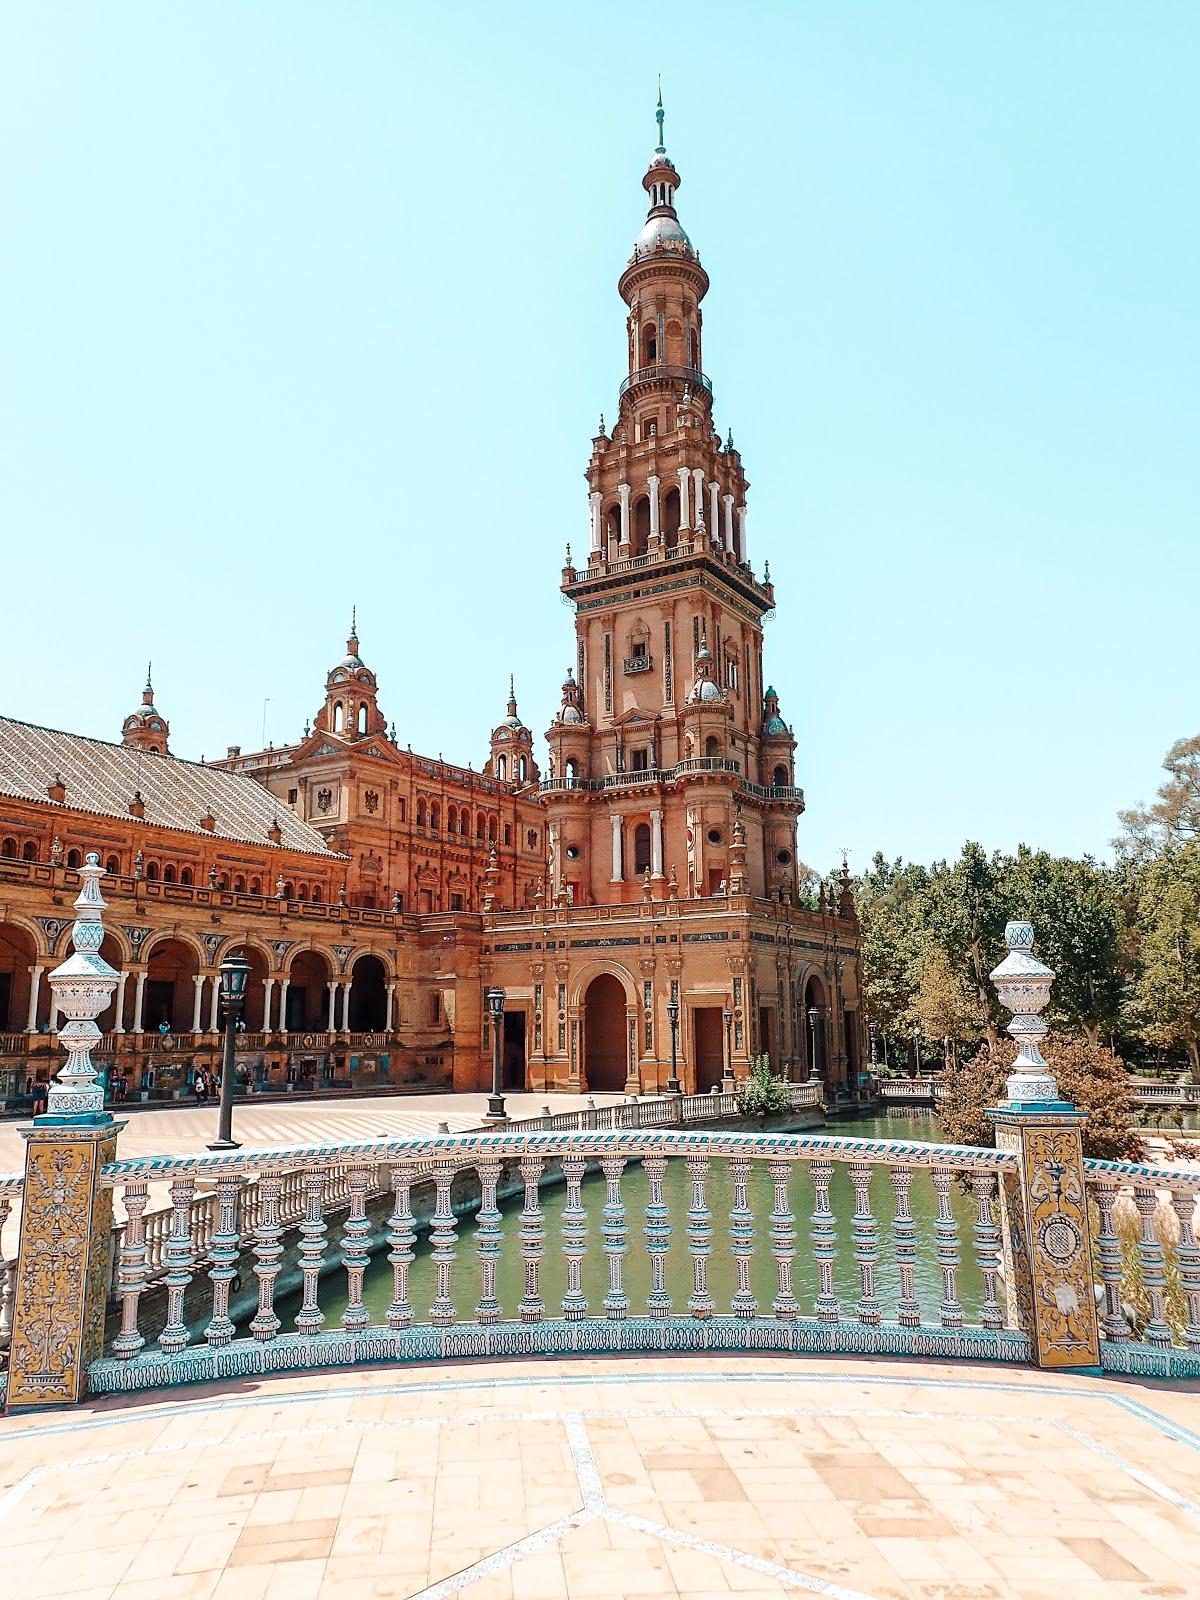 plaza-de-espana-seville-azulejos